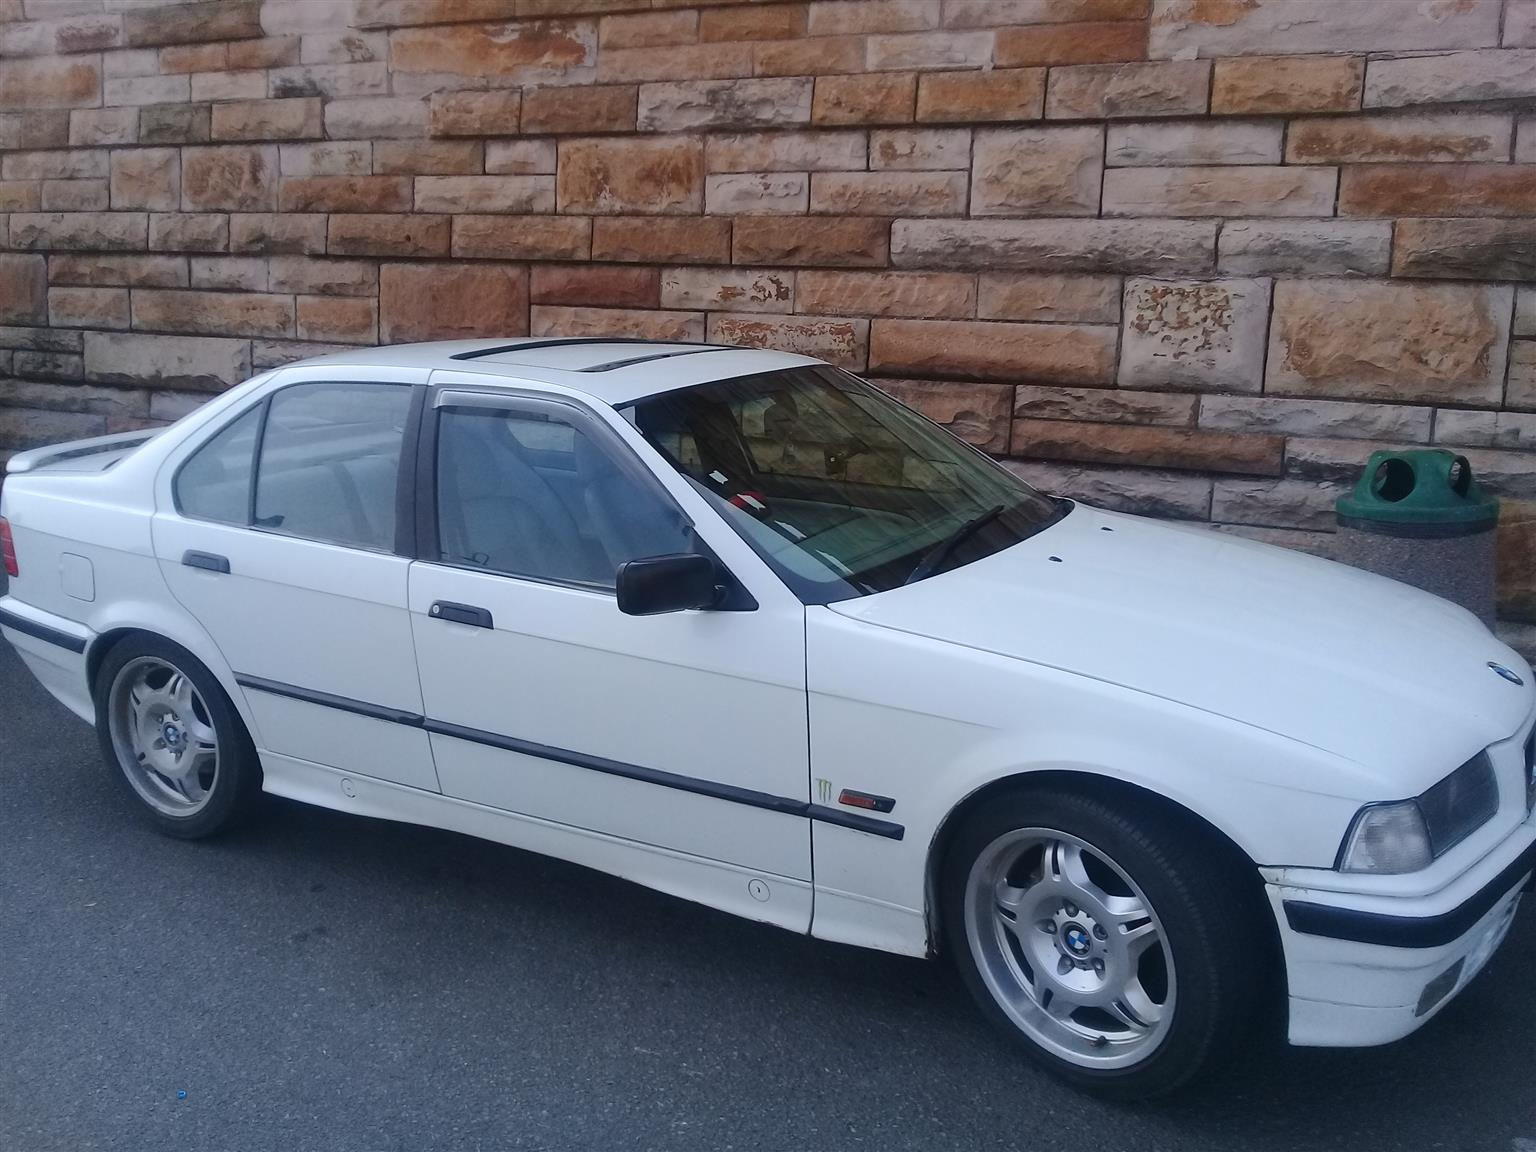 1994 BMW 3 Series | Junk Mail